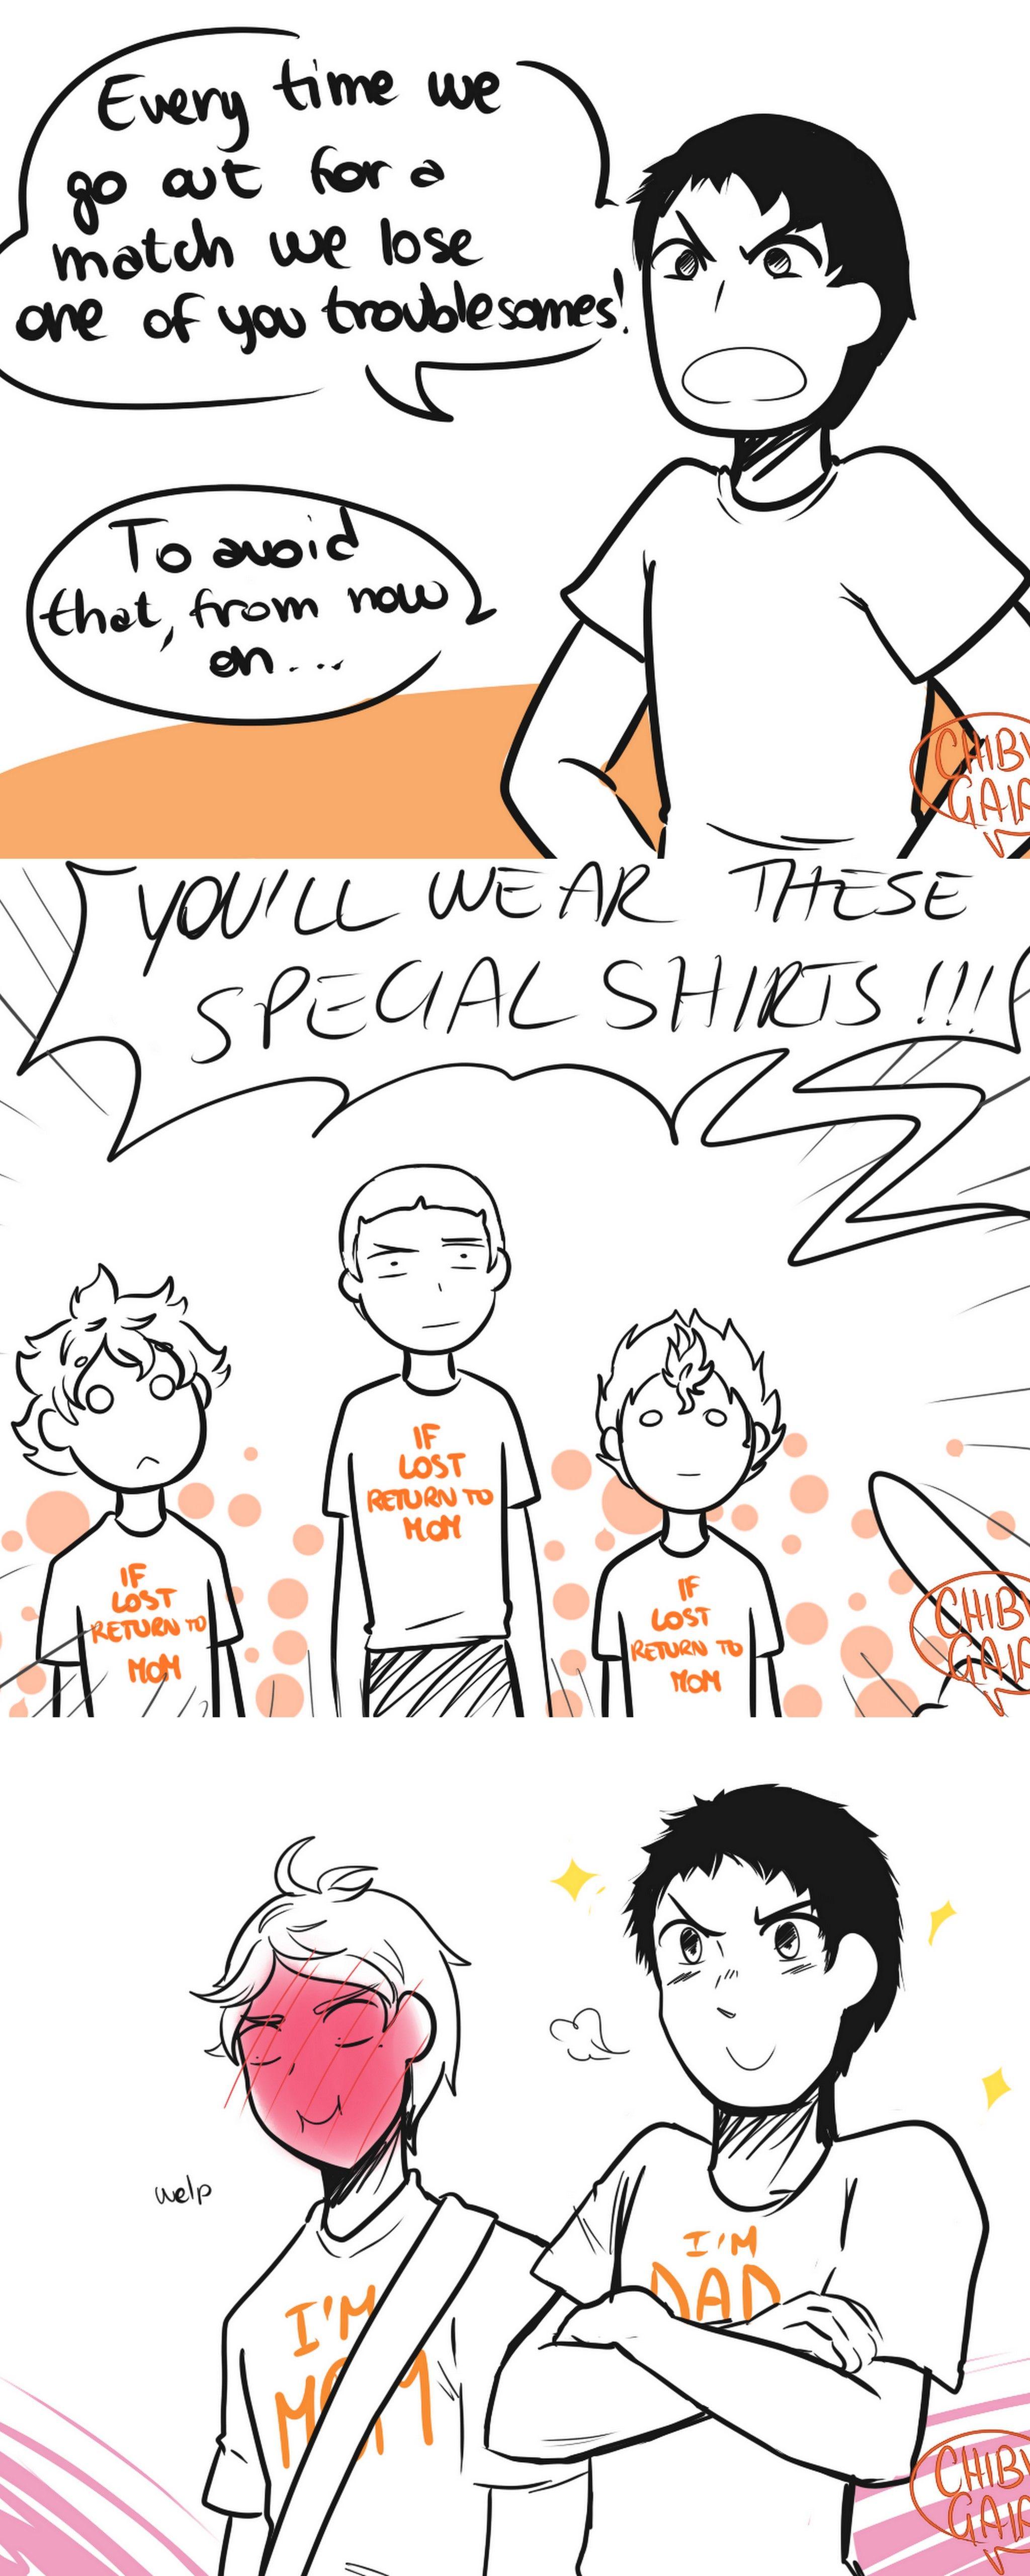 Crow Family Shirts Haikyuu Karasuno Haikyuu Funny Haikyuu Karasuno Haikyuu Anime